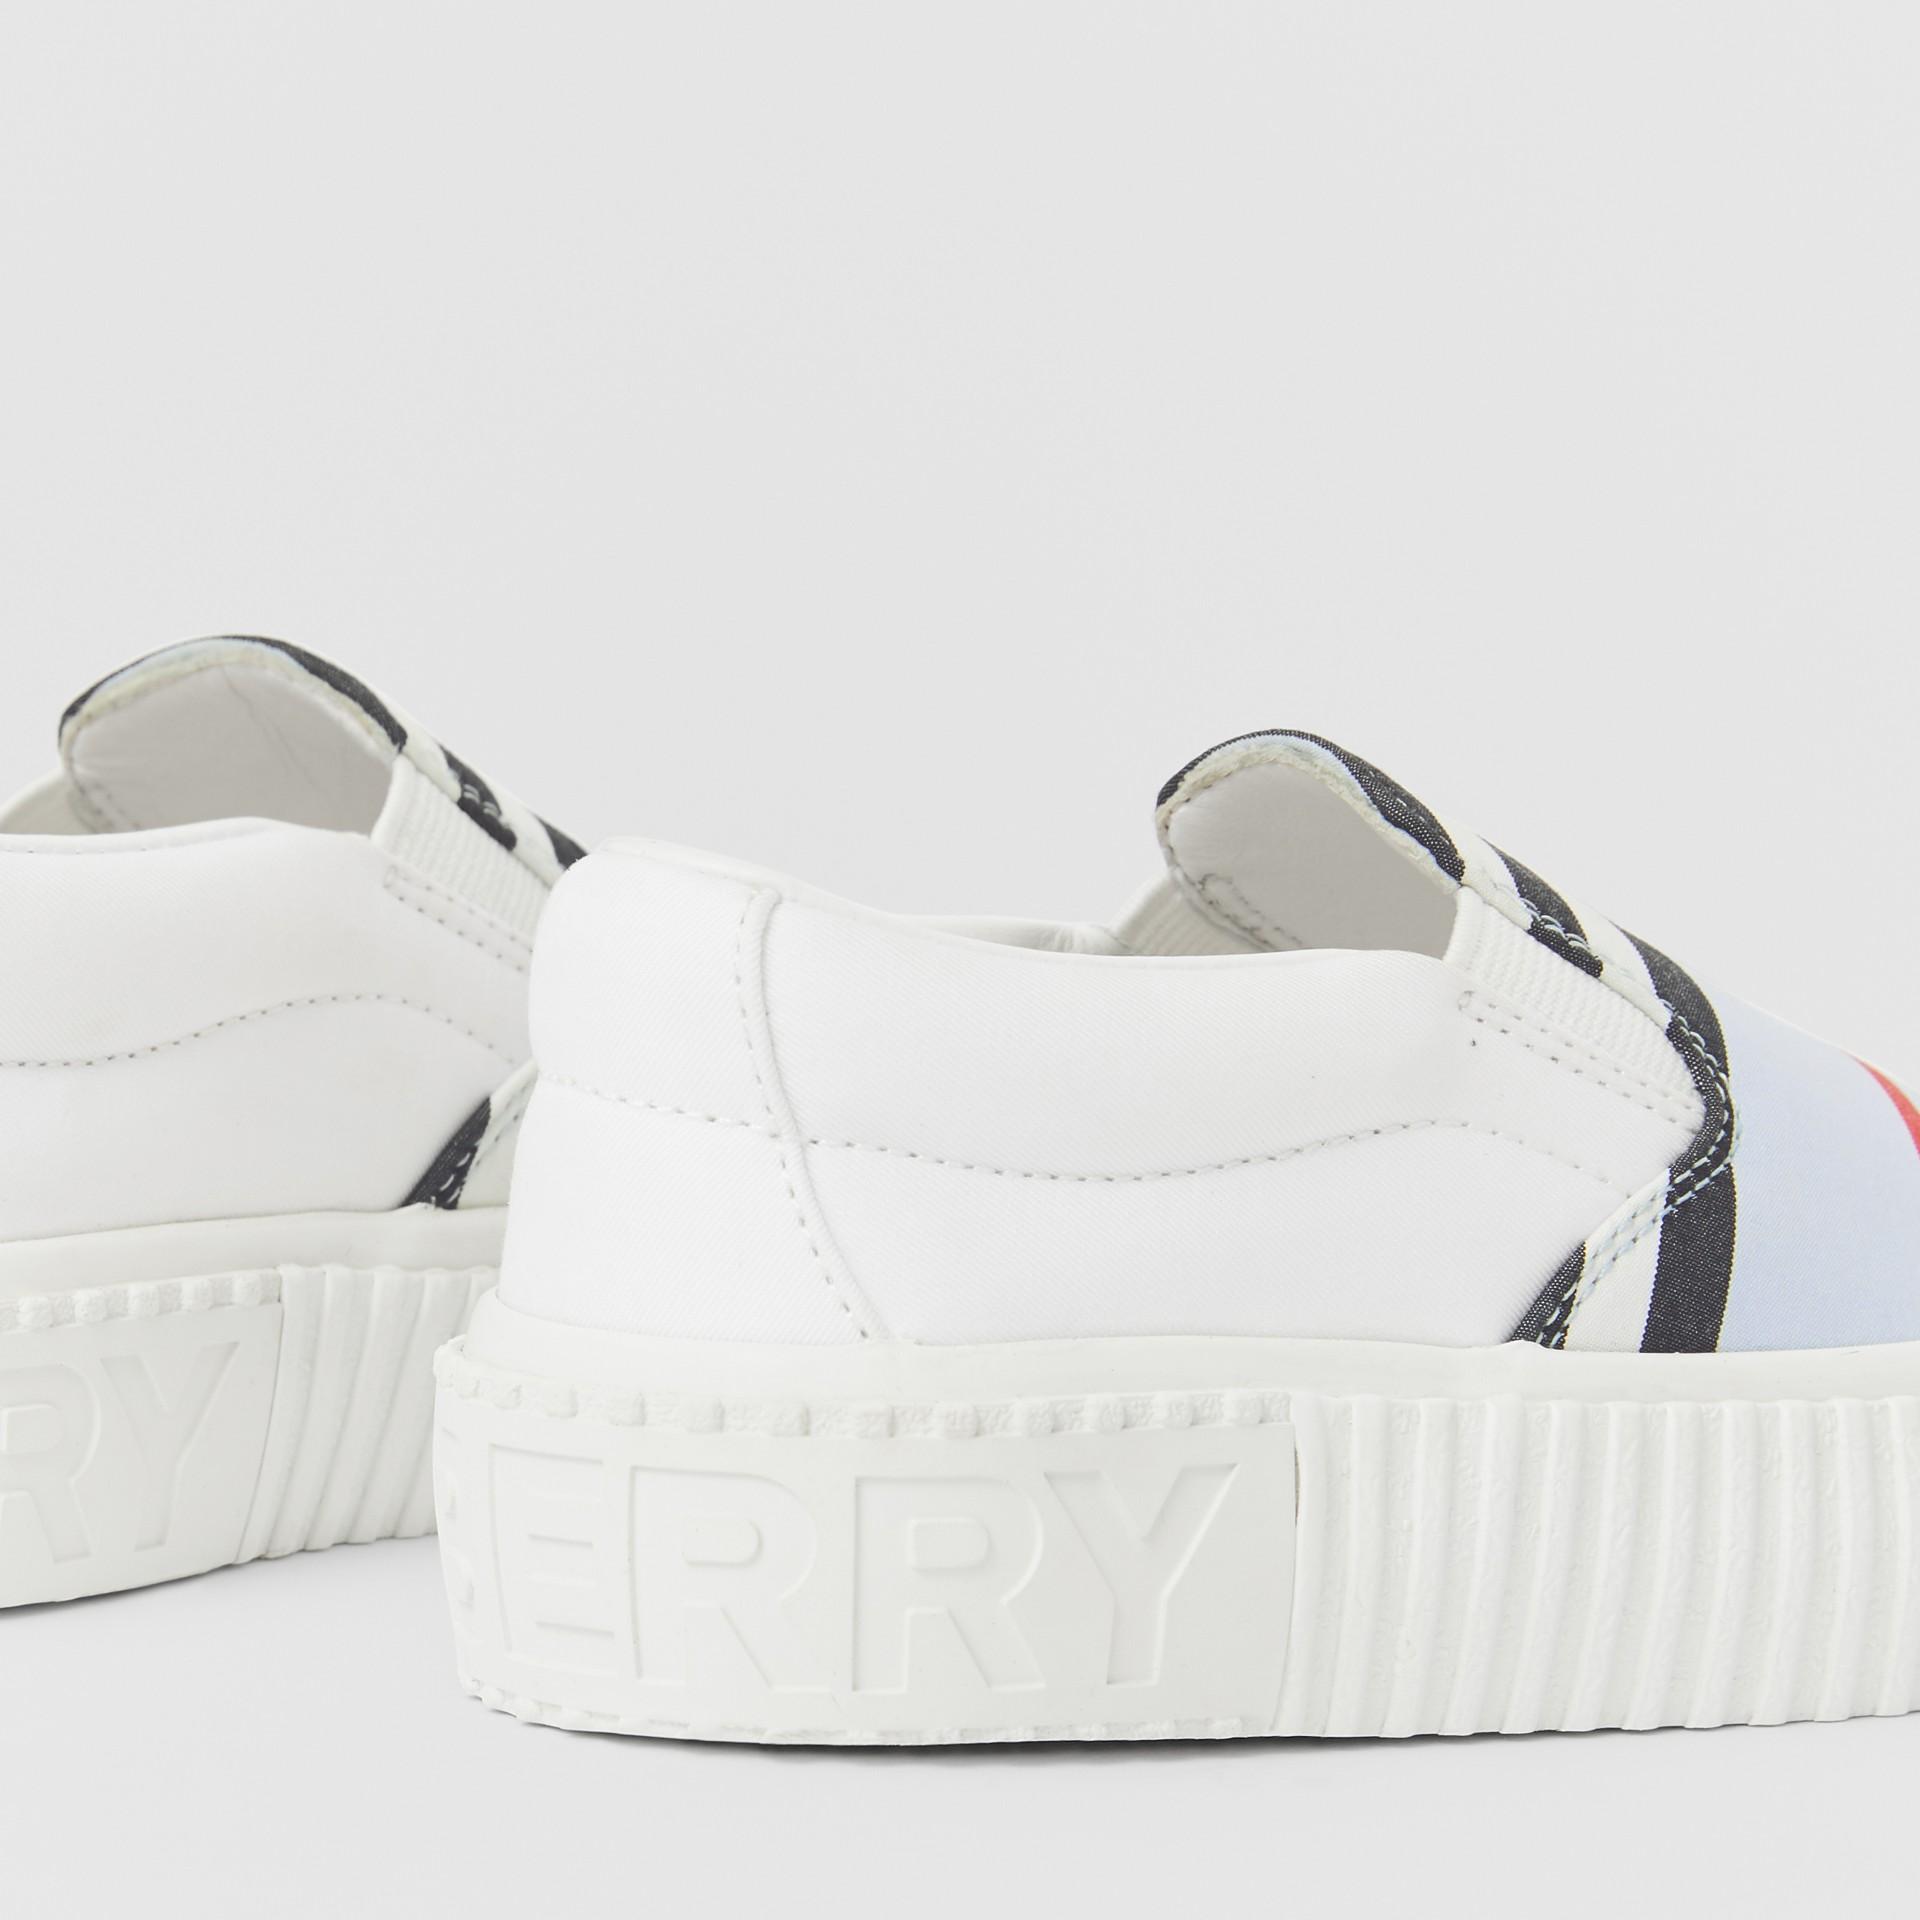 Icon Stripe Cotton Slip-on Sneakers in Pale Blue - Children | Burberry Australia - gallery image 1